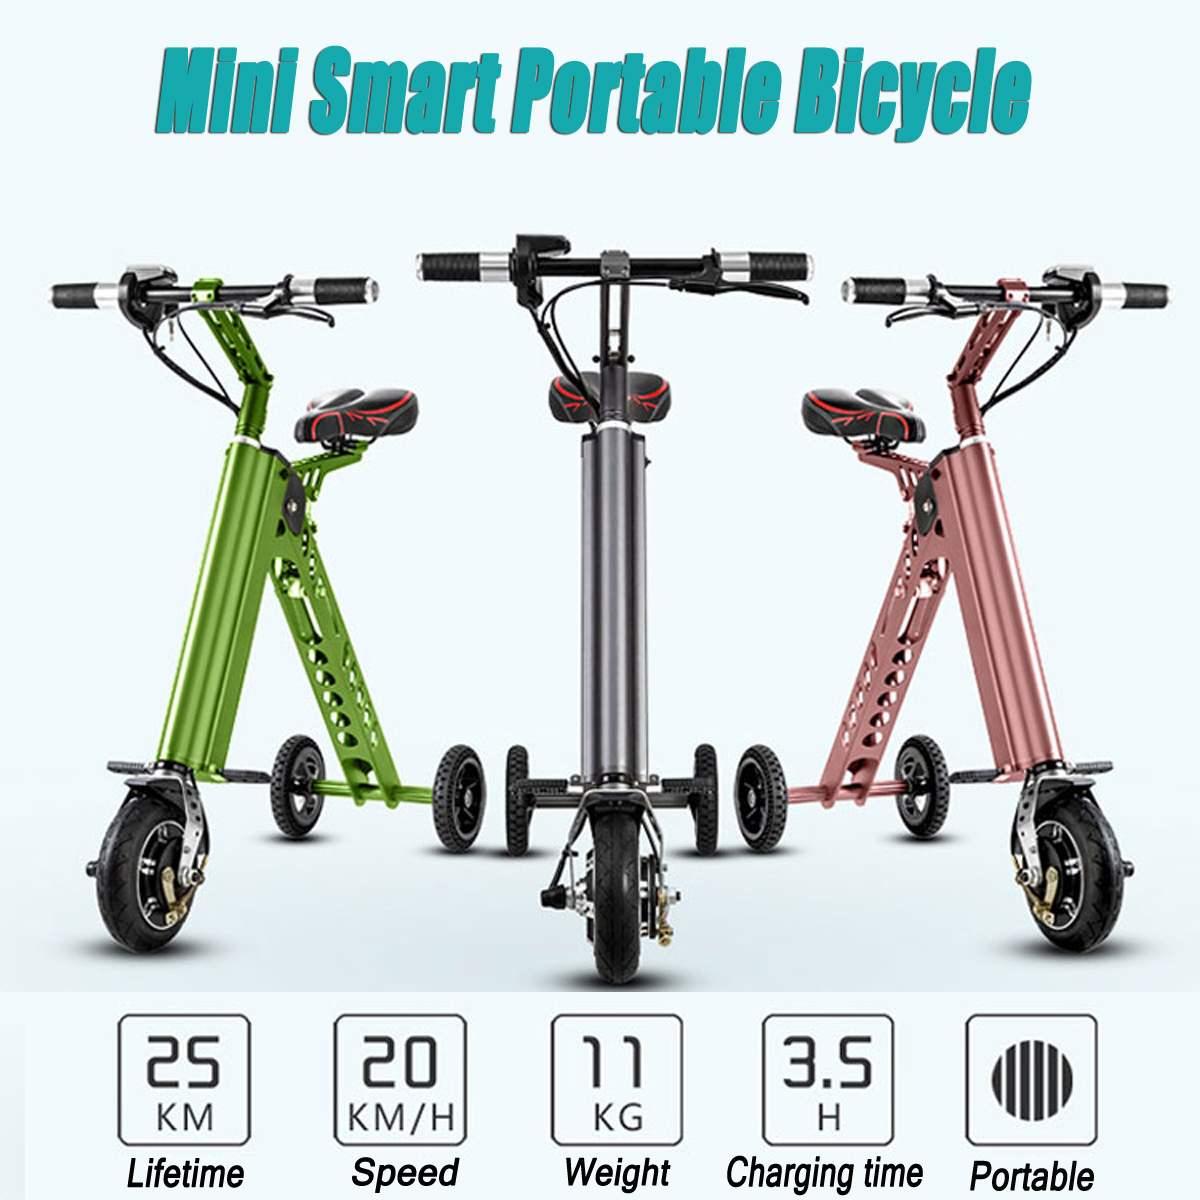 8 Mini Portable Bicycle Folding Electric Bike Mini Folding Electric Bike Travel Smart Instead Walking Tool Scooter 3 Wheels